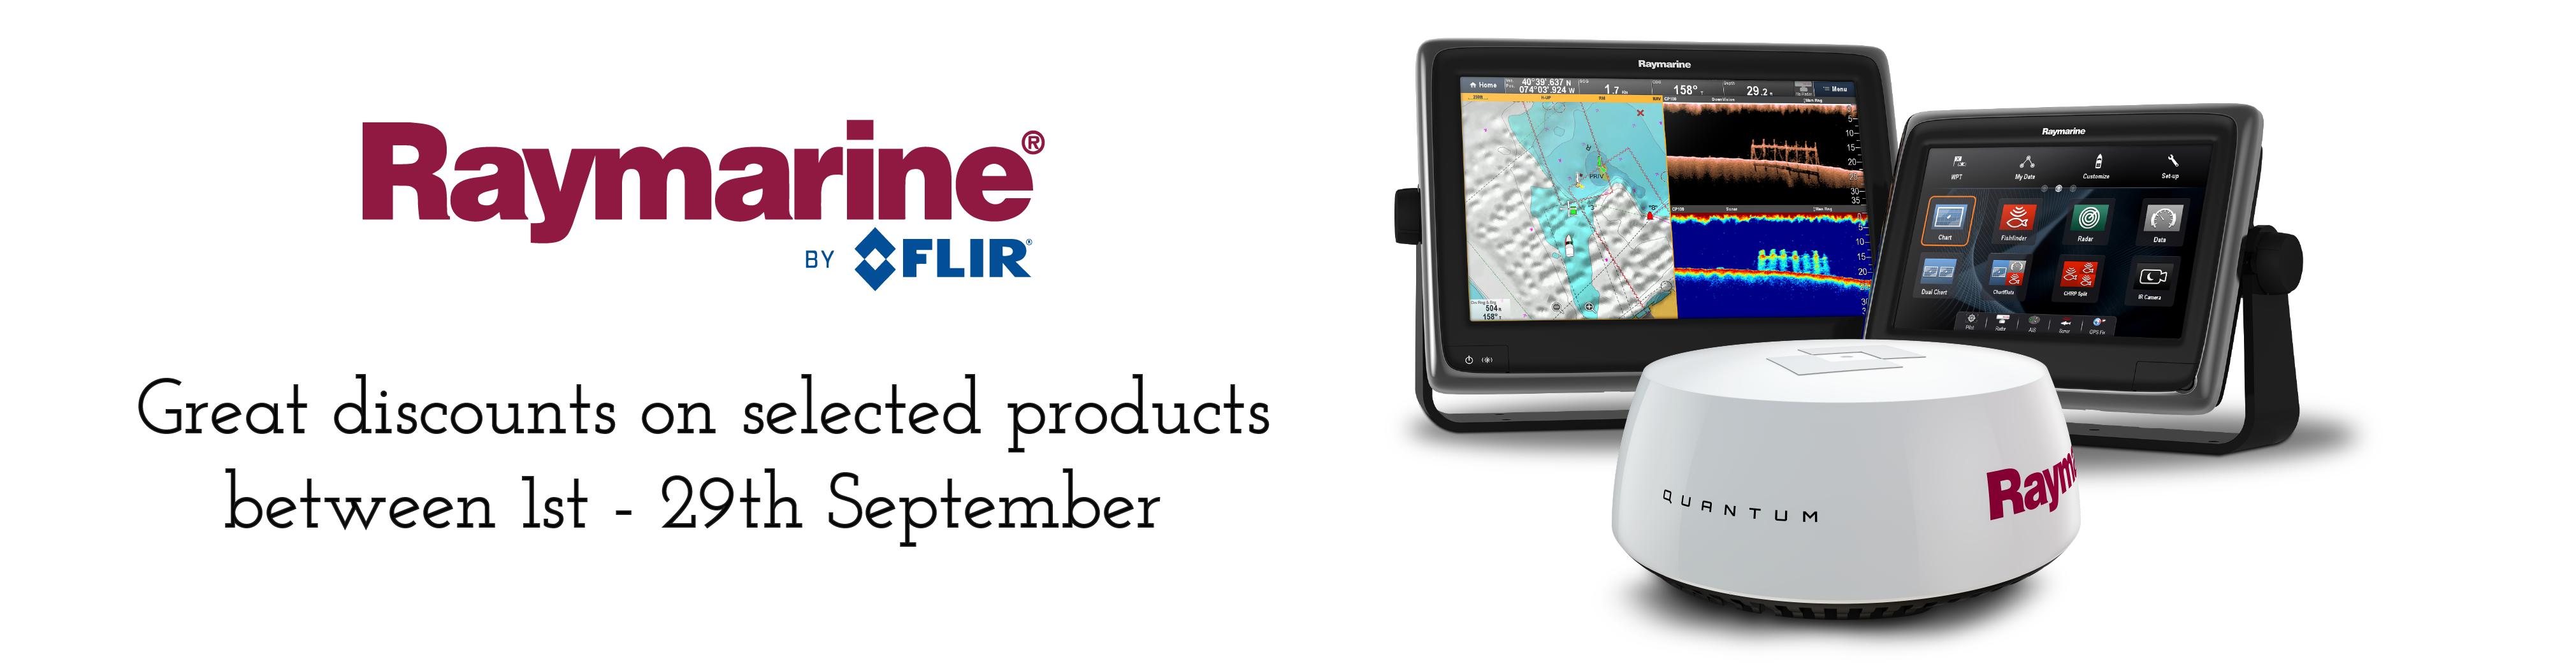 raymarine multifunction display radar great discounts banner